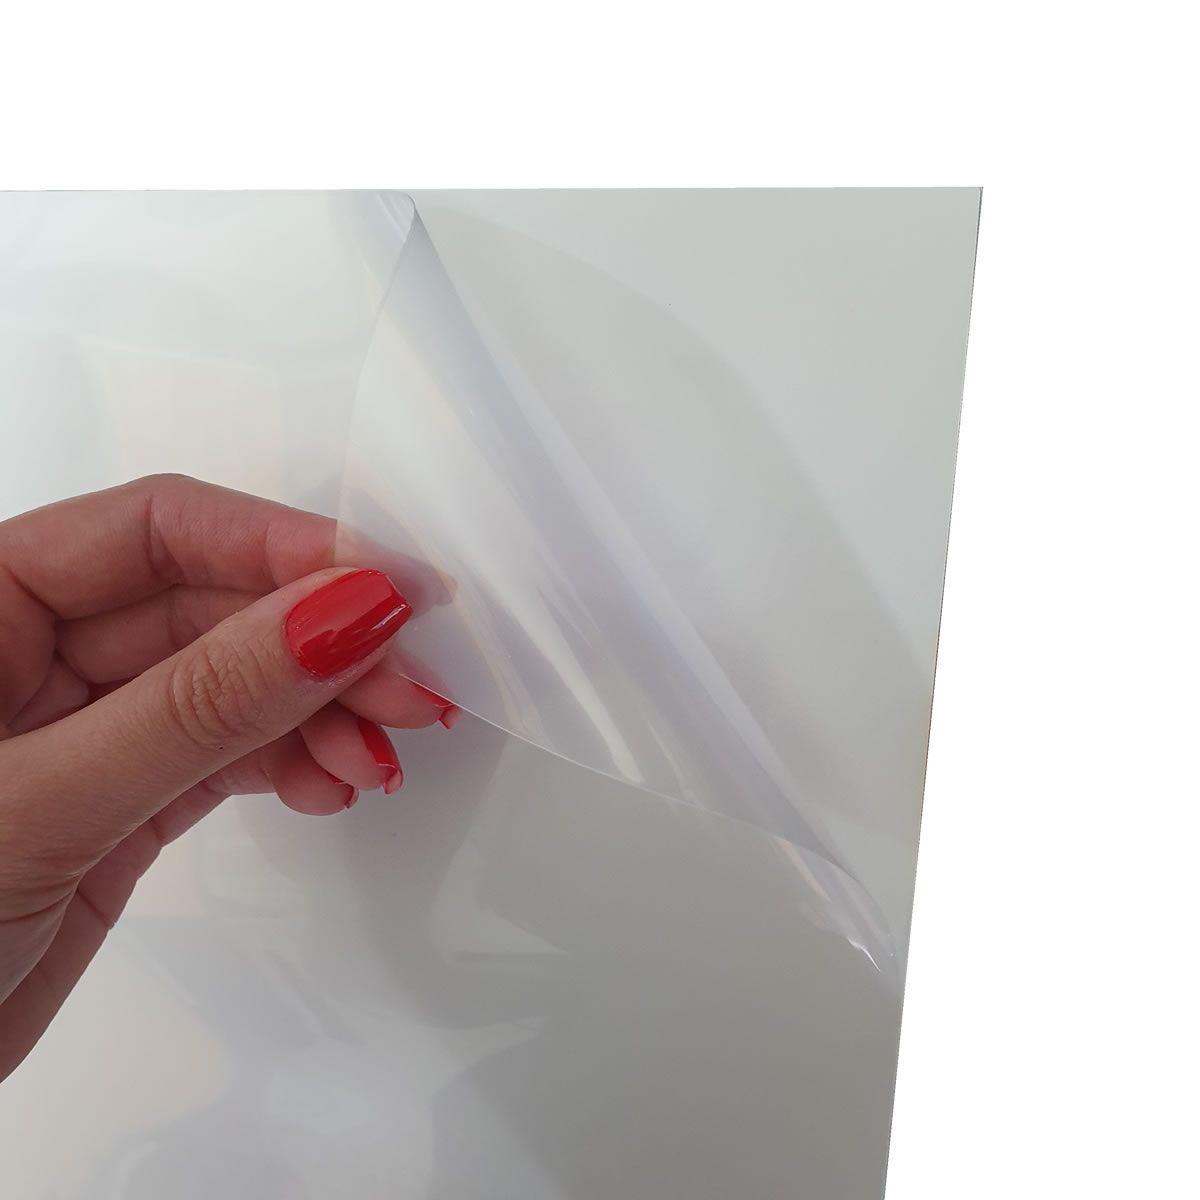 Papel Adesivo Vinil Transparente para Jato de Tinta Inkjet Printer 20 folhas A4 Evolut